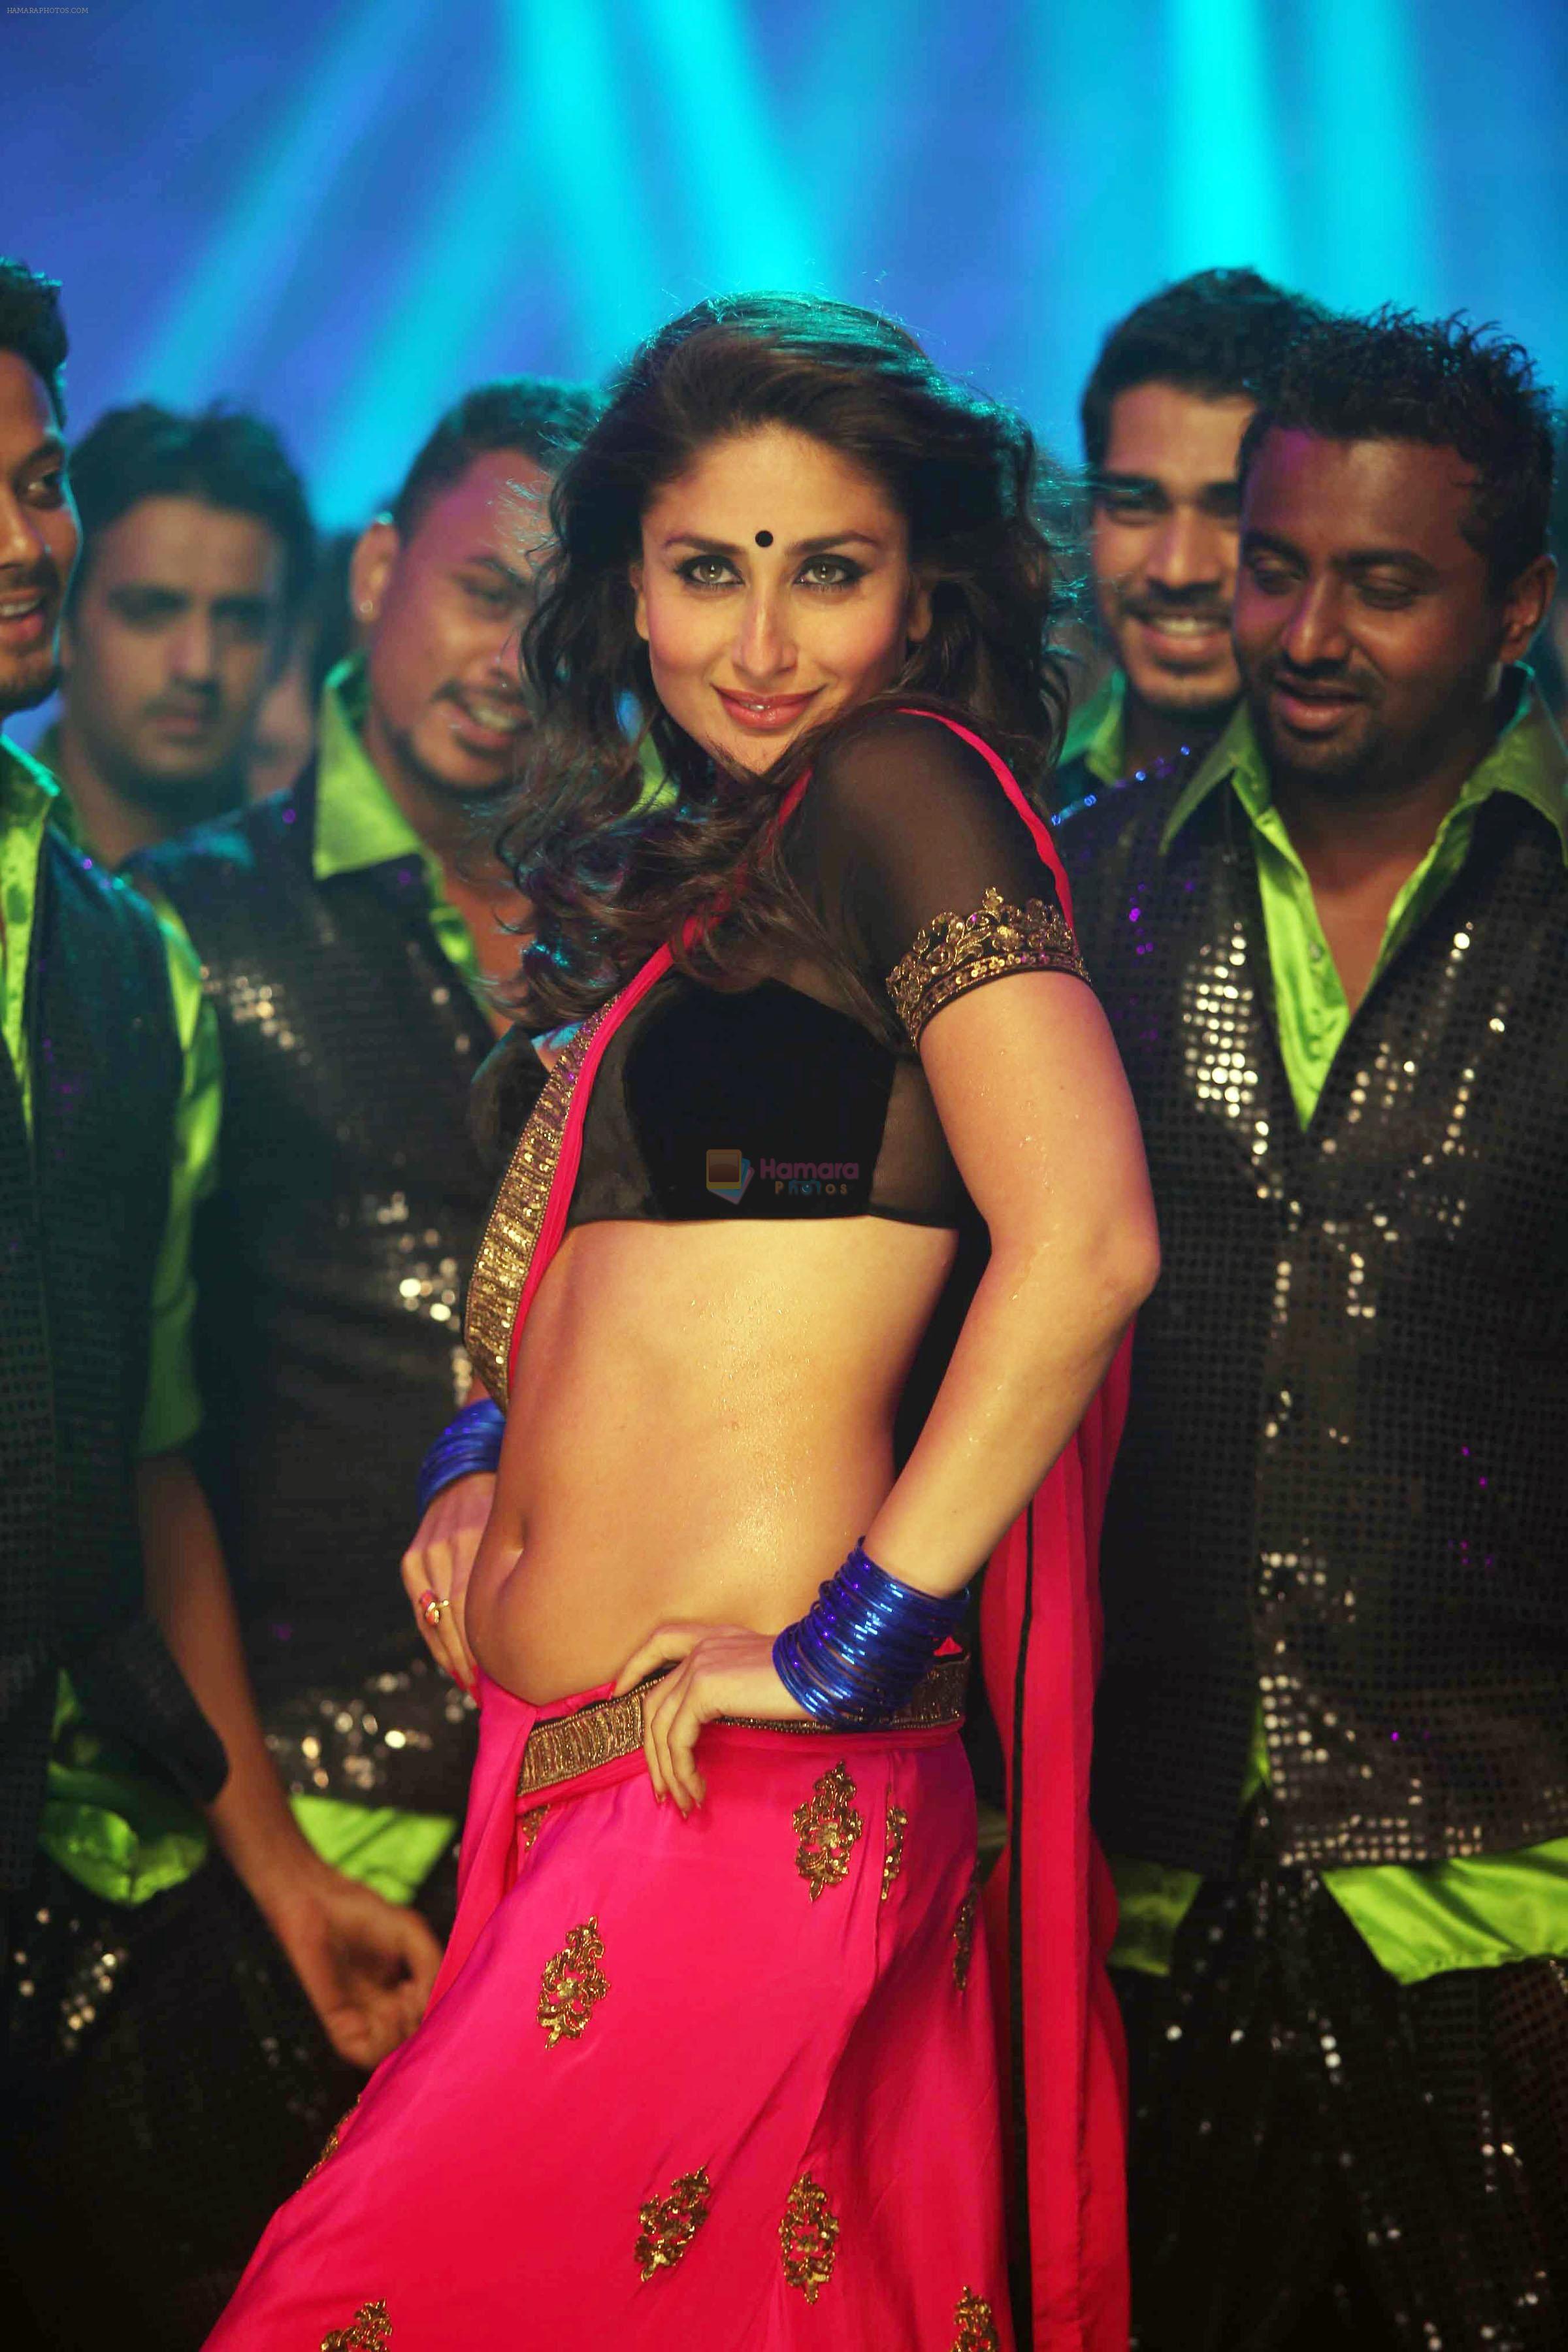 Kareena Kapoor In The Song Halkat Jawani From The Film Heroine Img 5047 Kareena Kapoor Bikini Kareena Kapoor Pics Kareena Kapoor